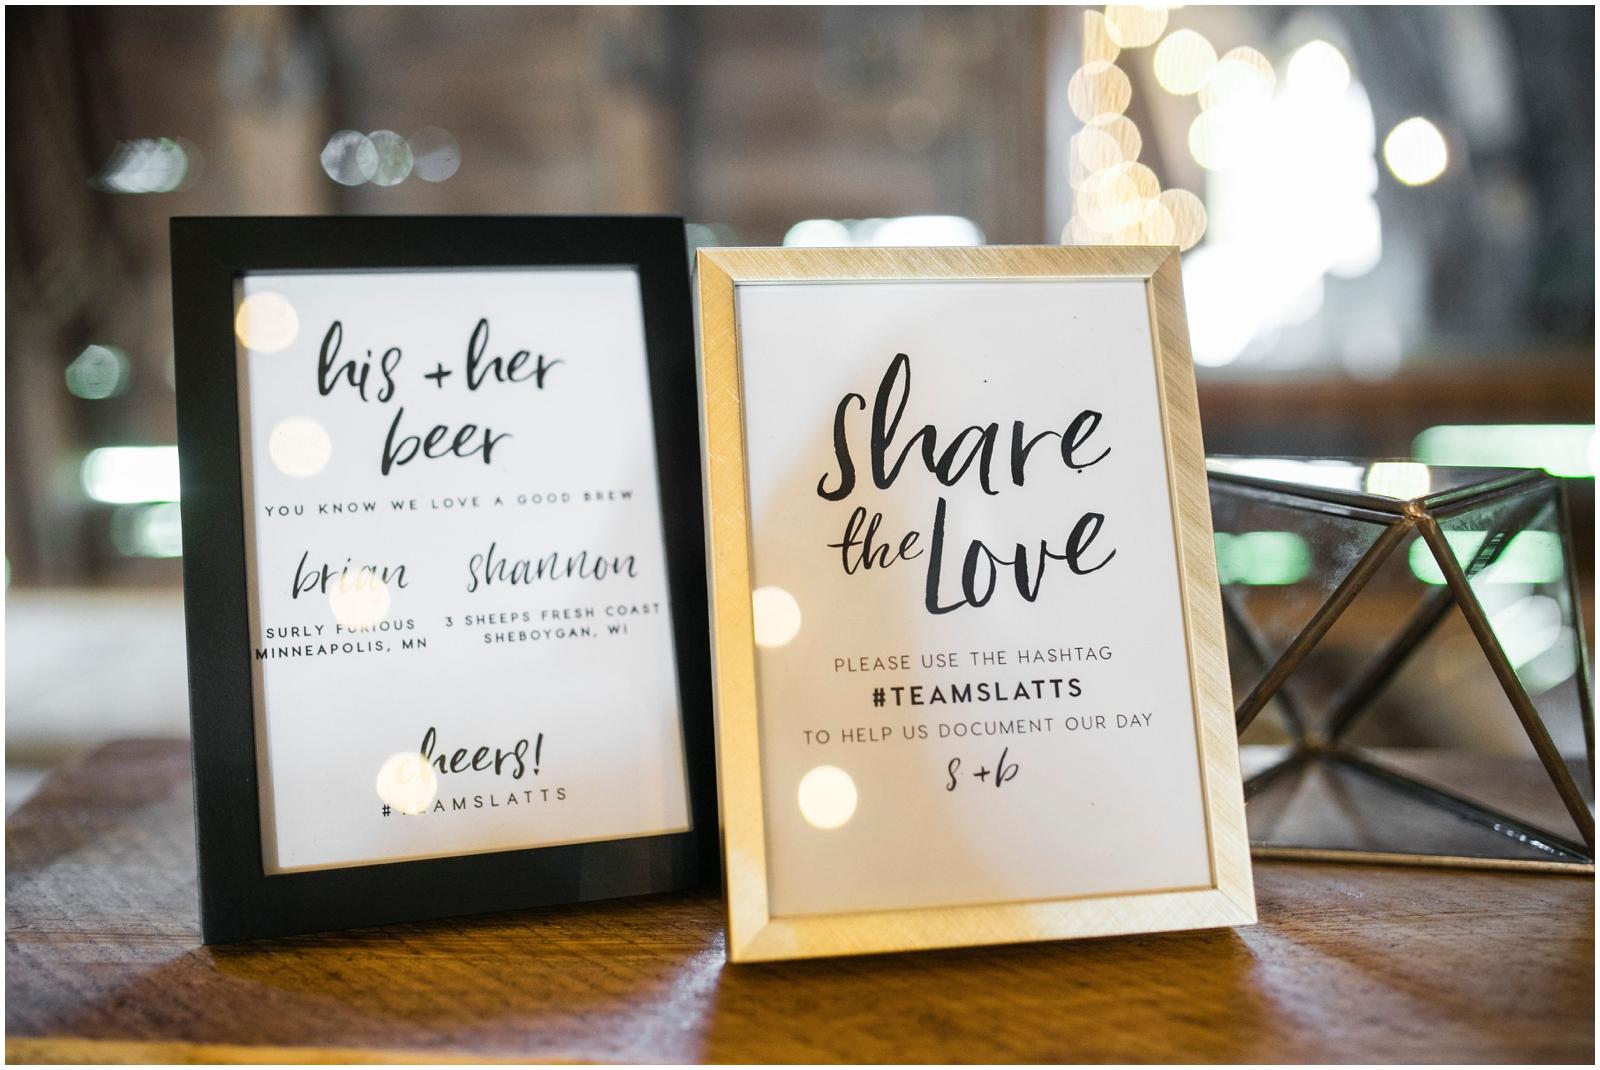 Share the love hashtag wedding